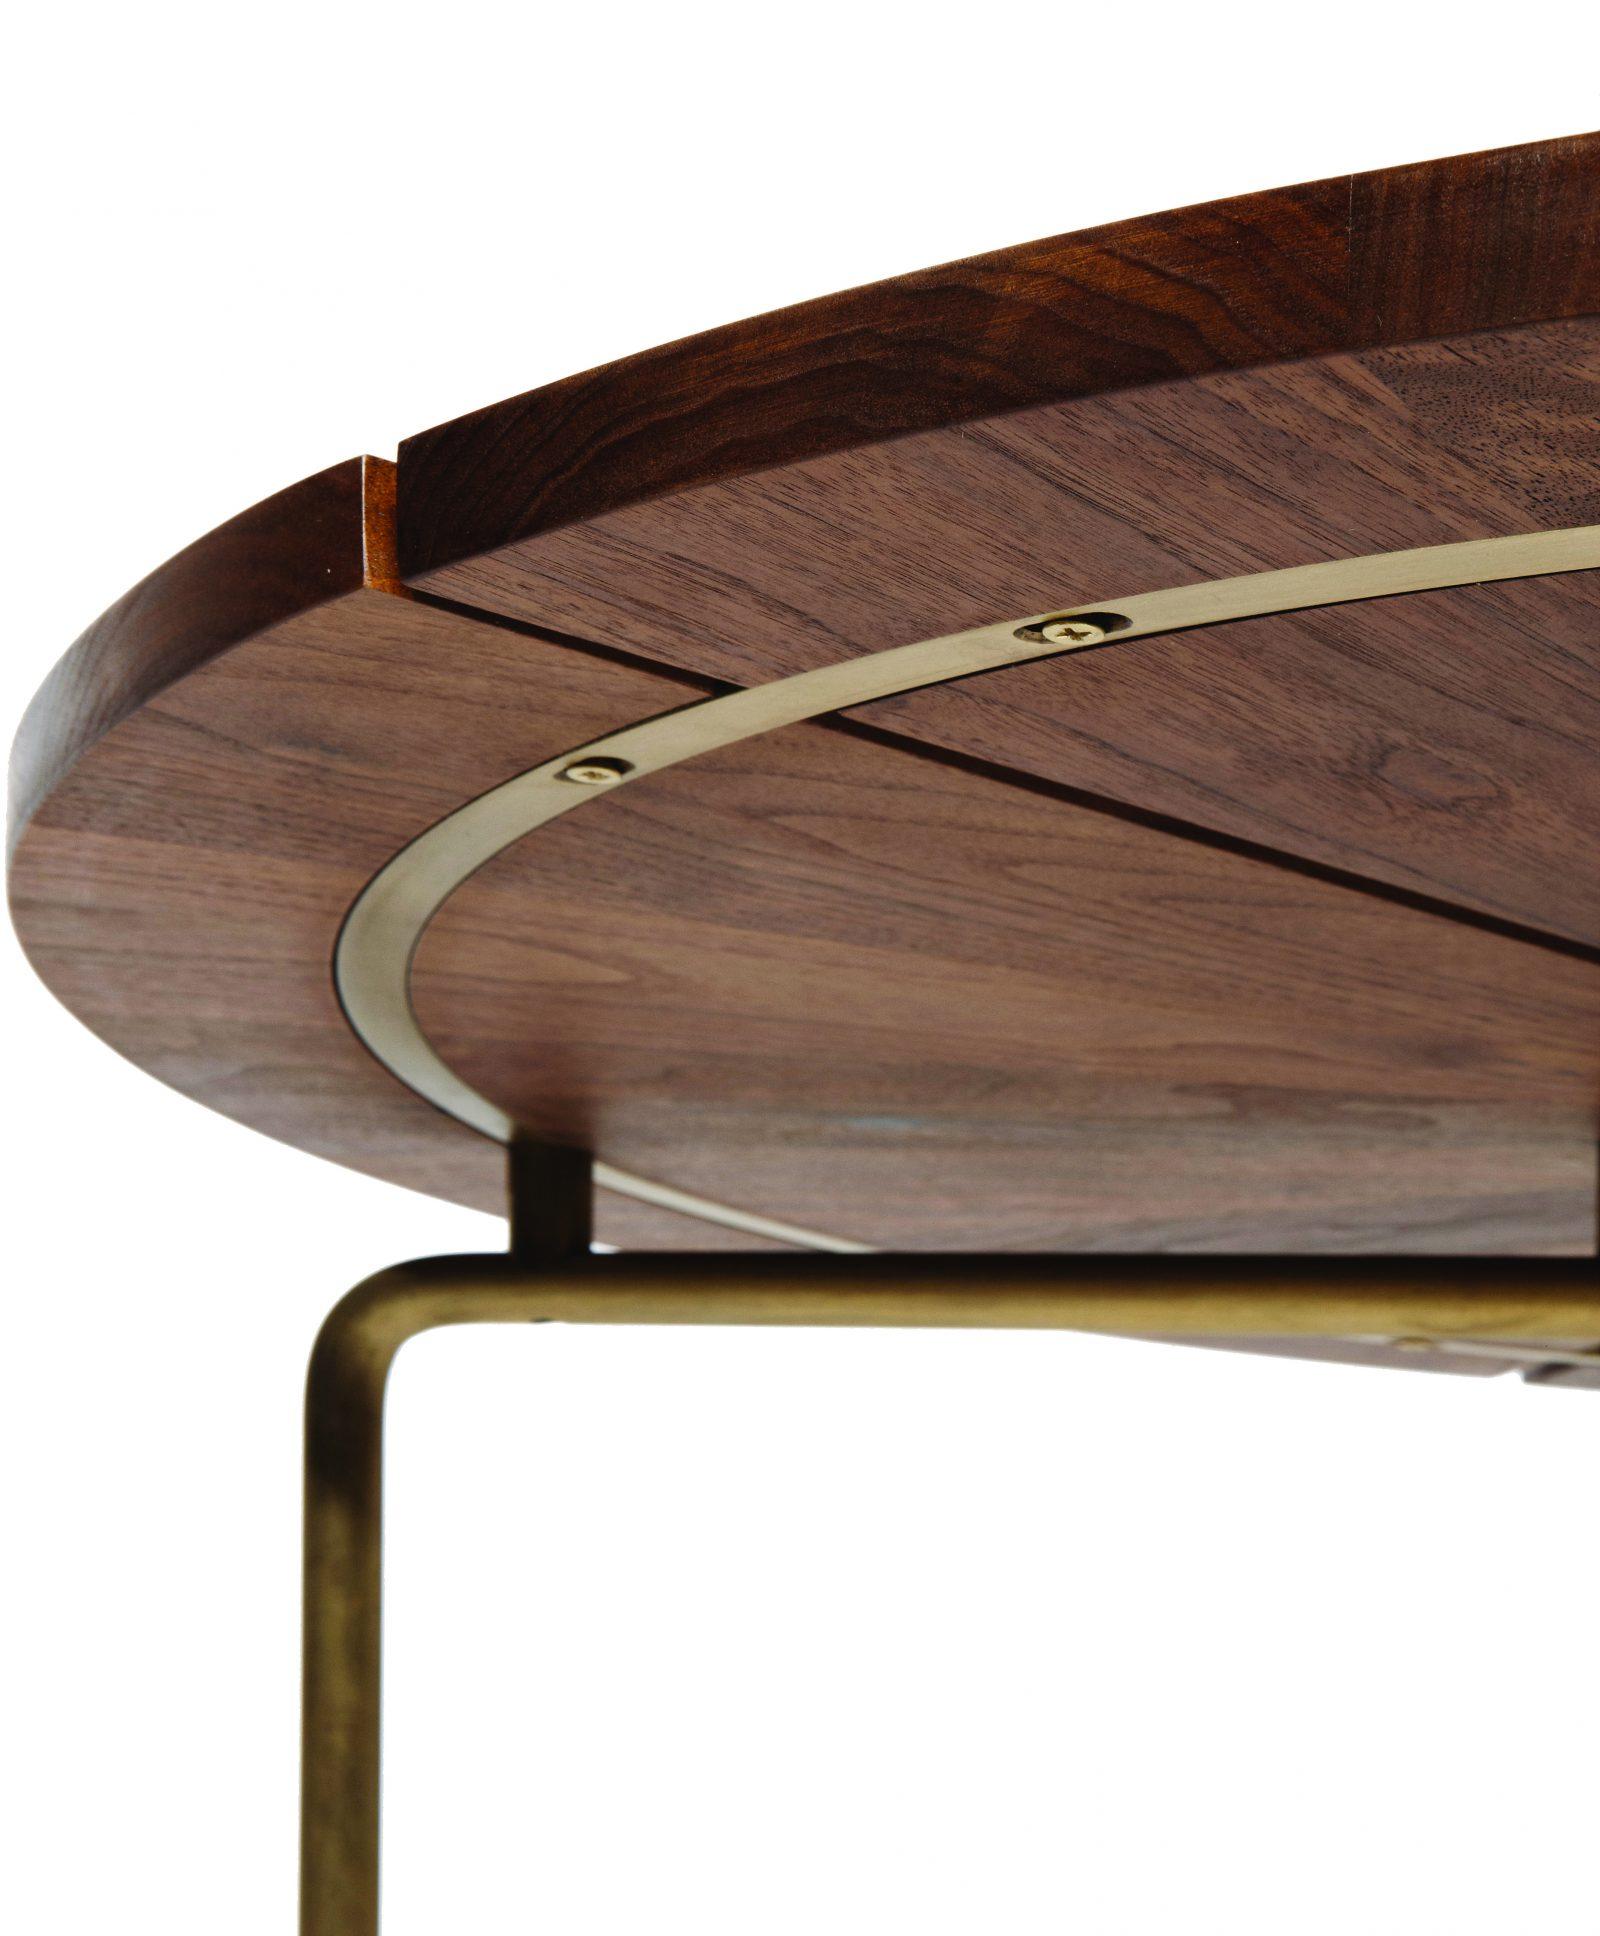 Circular Table detail of solid oxidized brass base, credit MATTEO MENDIOLA